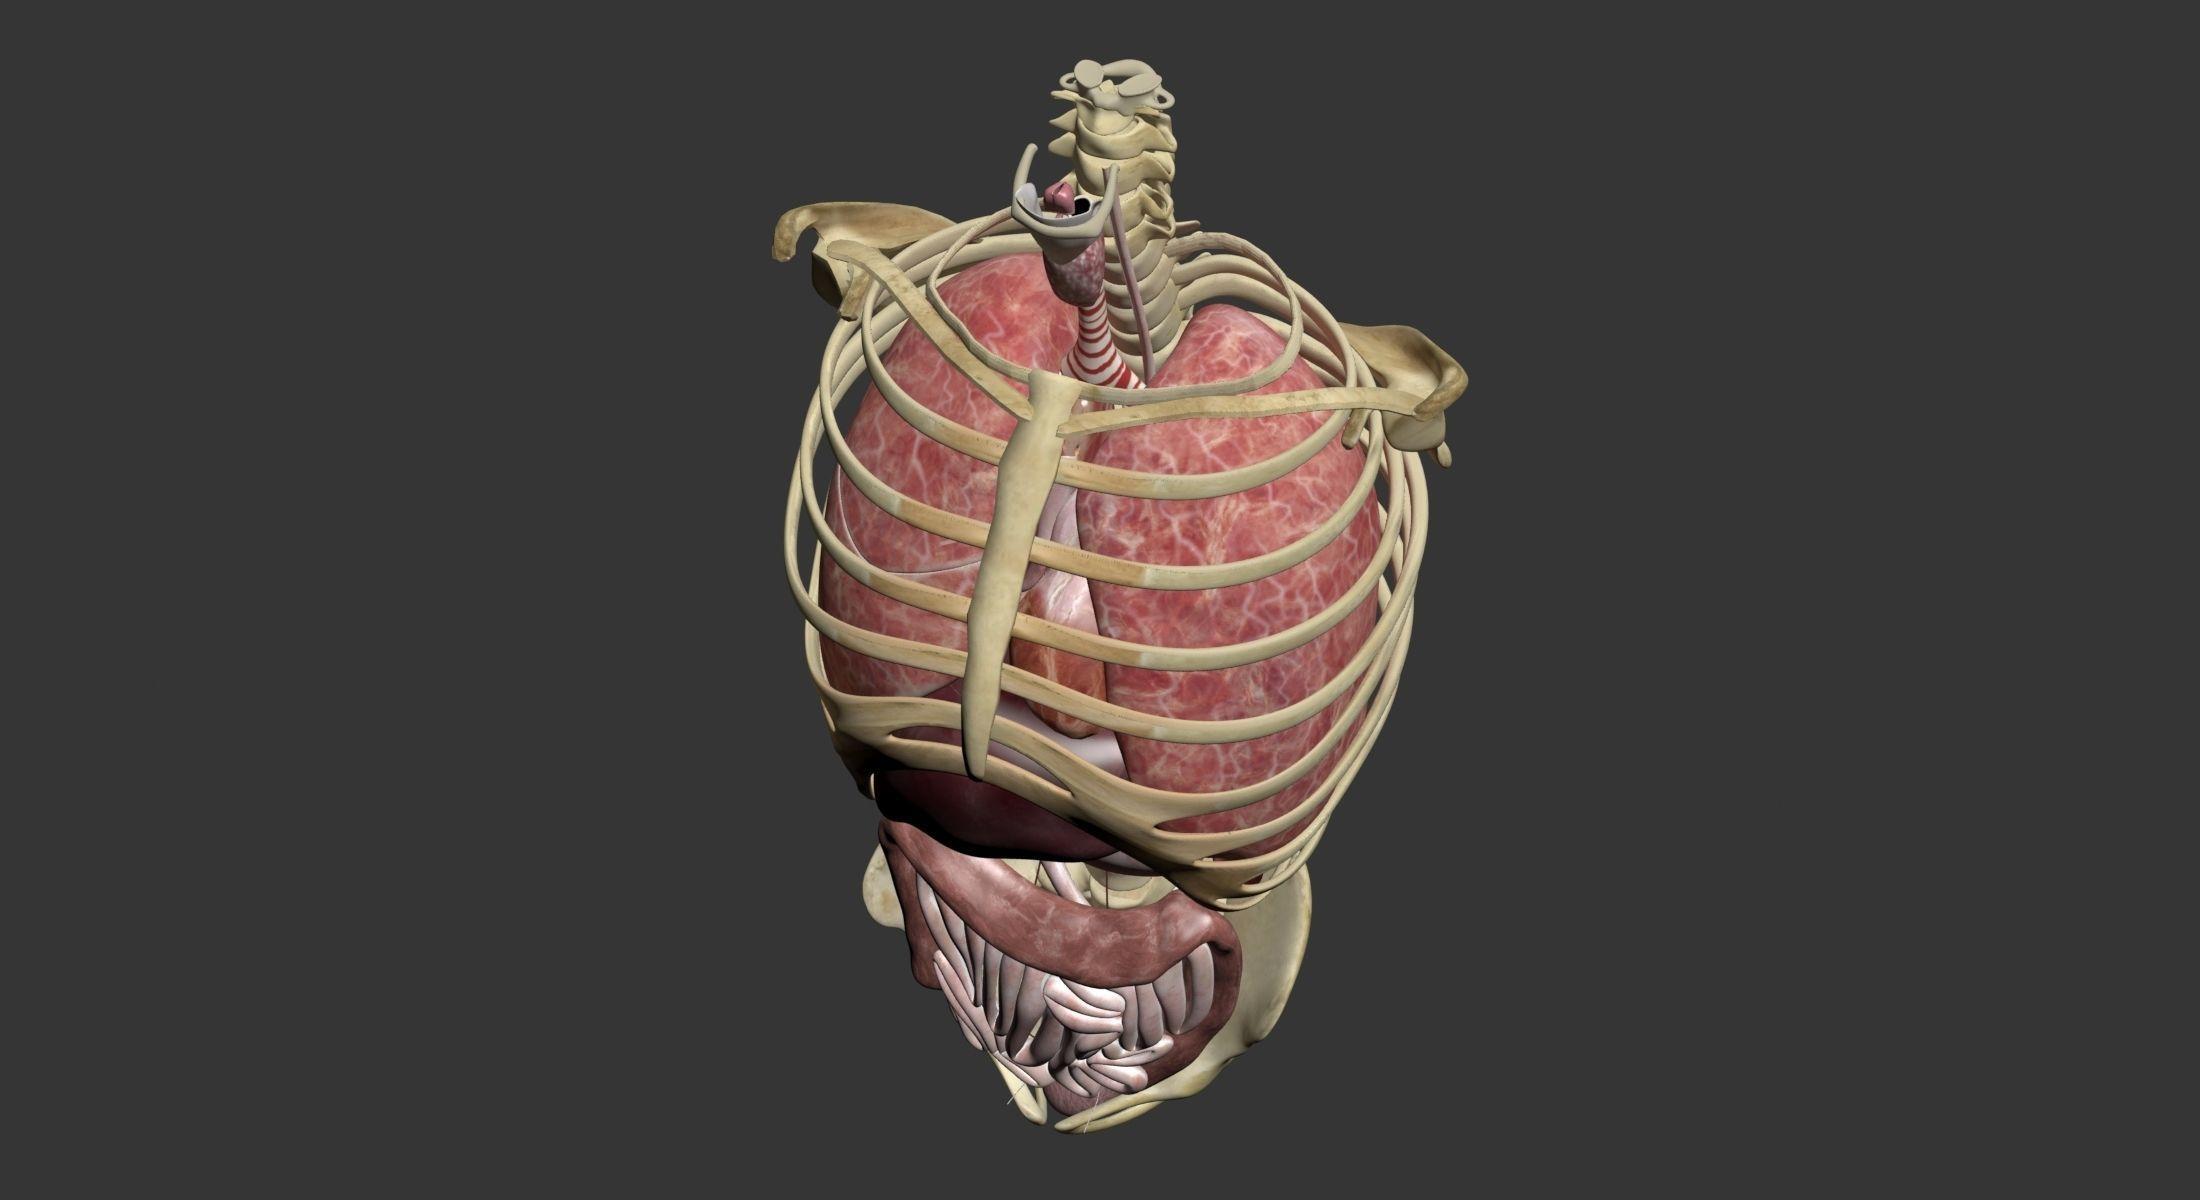 3d Model Torso Anatomy Cgtrader